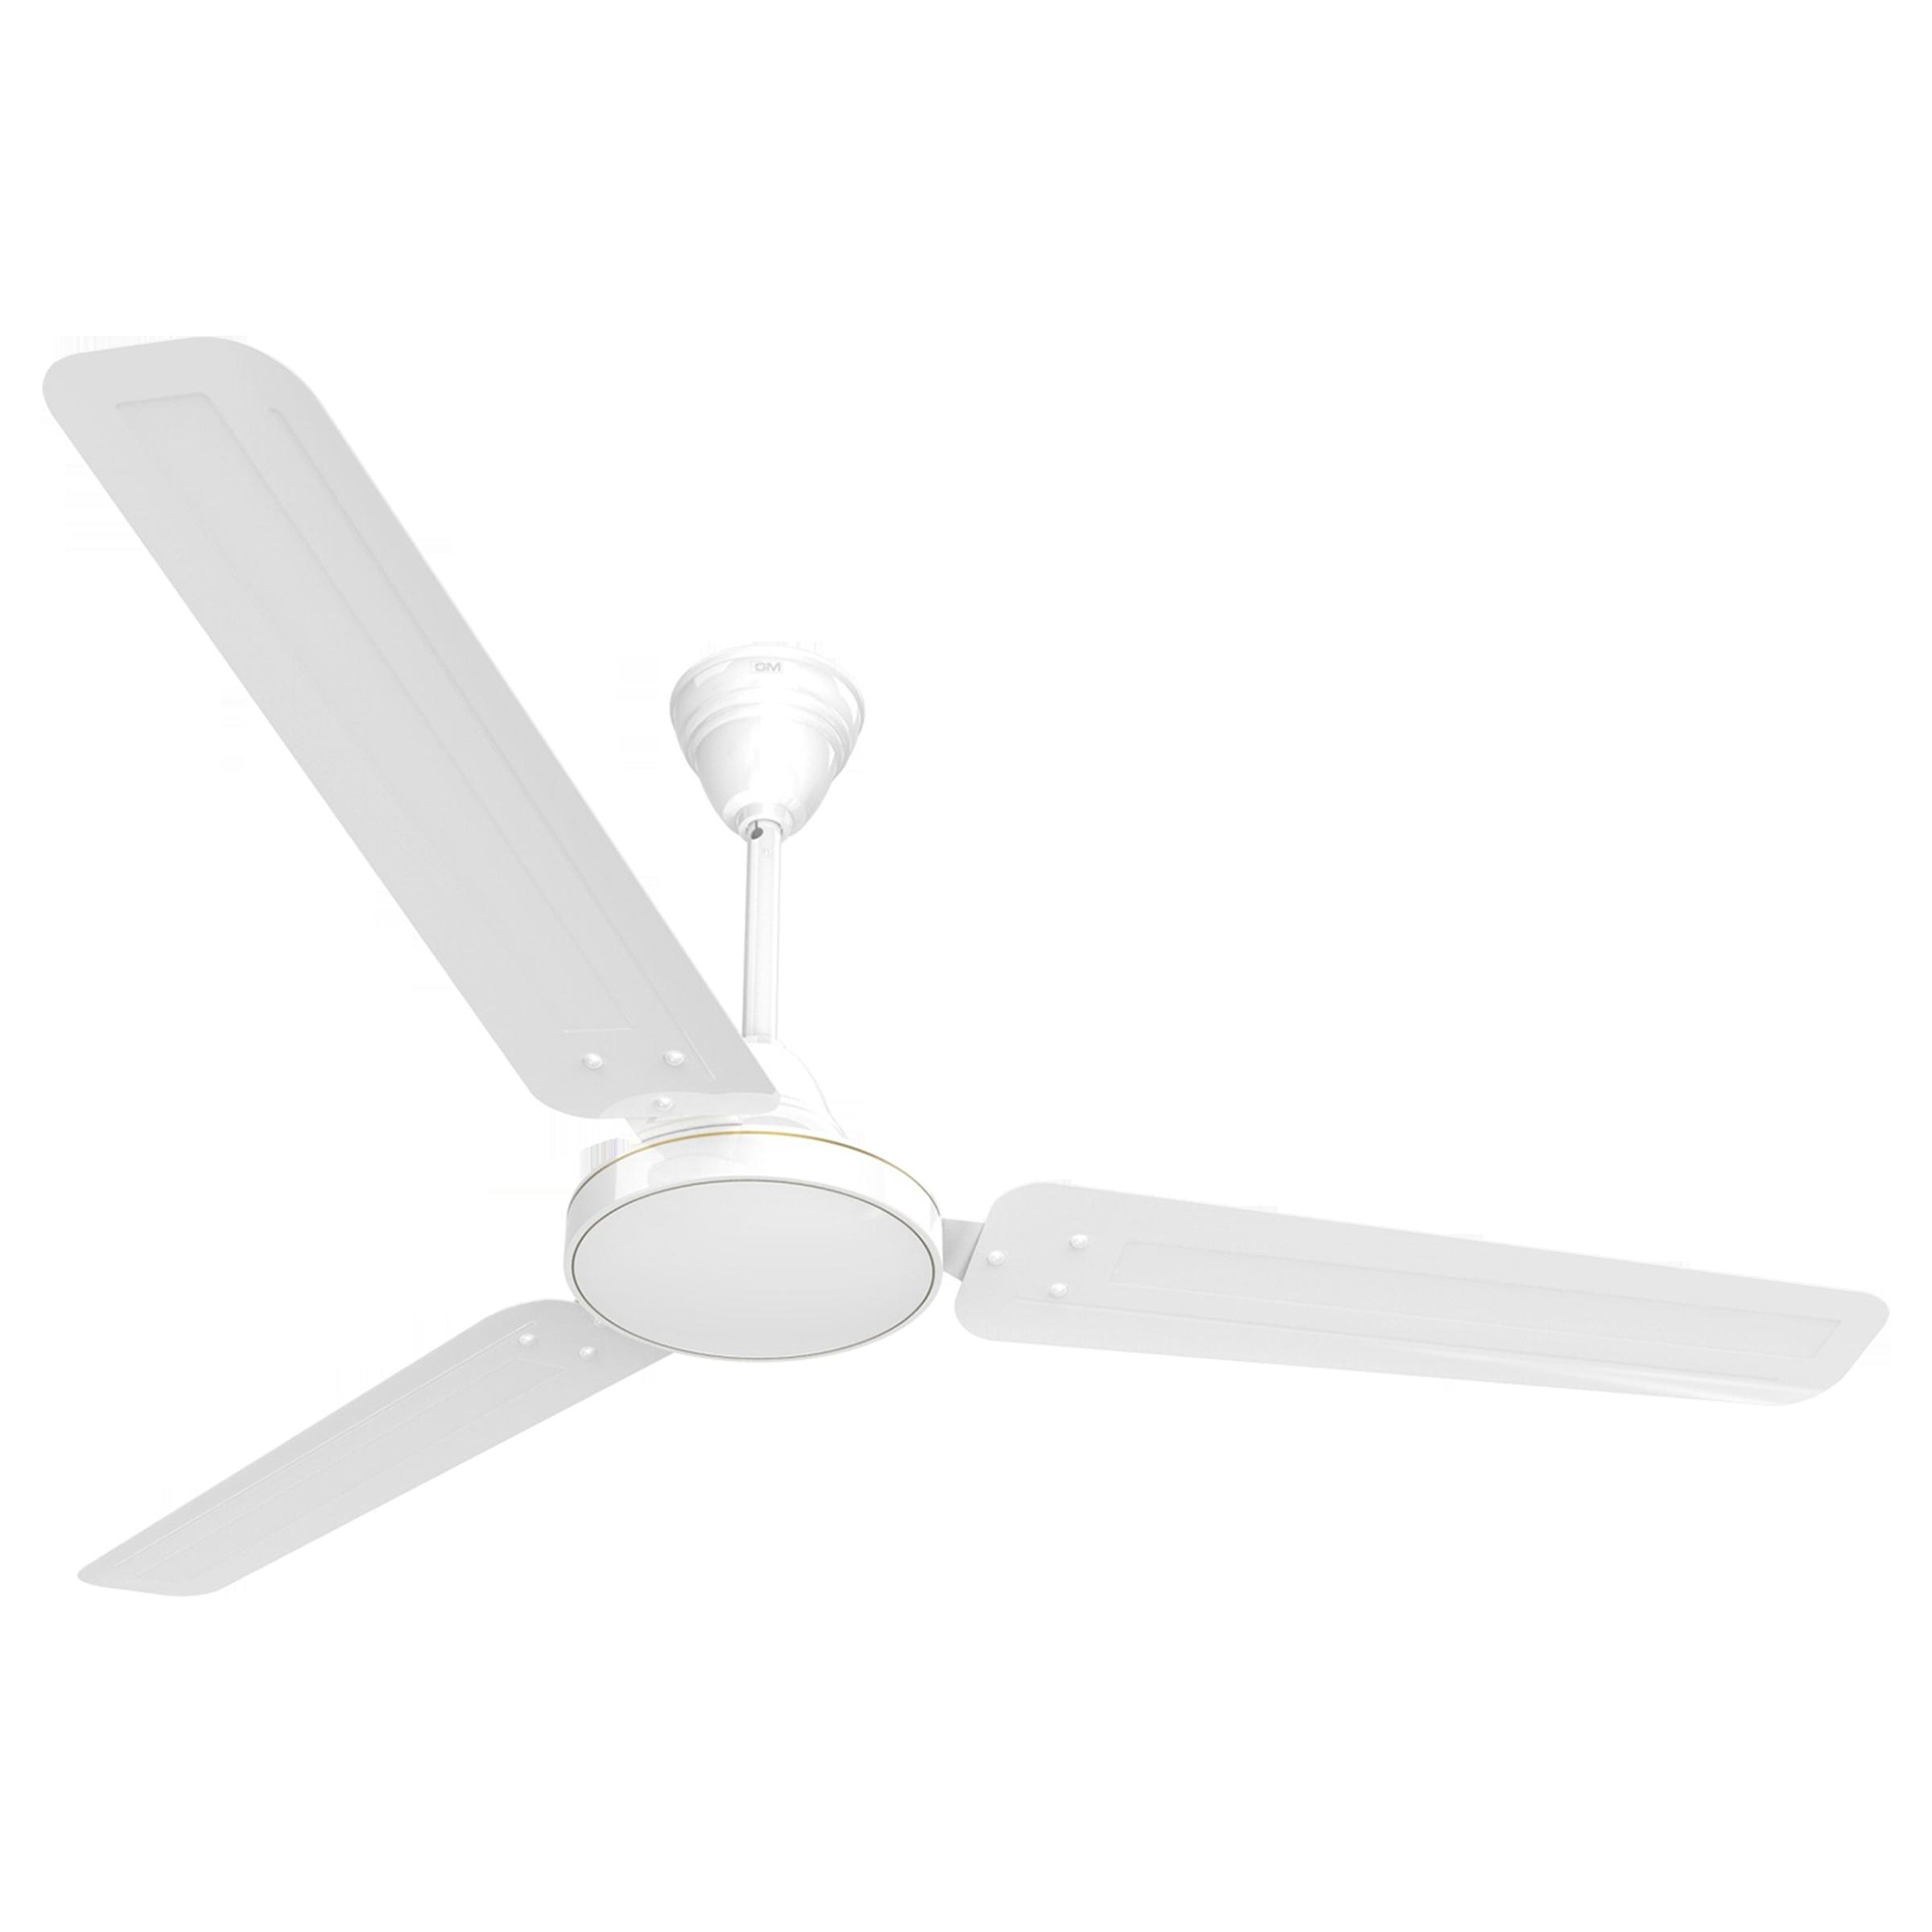 GM AIR9 Plus 120 cm Sweep 3 Blade Ceiling Fan (Double Ball Bearing, CFB480032WHGL, White)_1